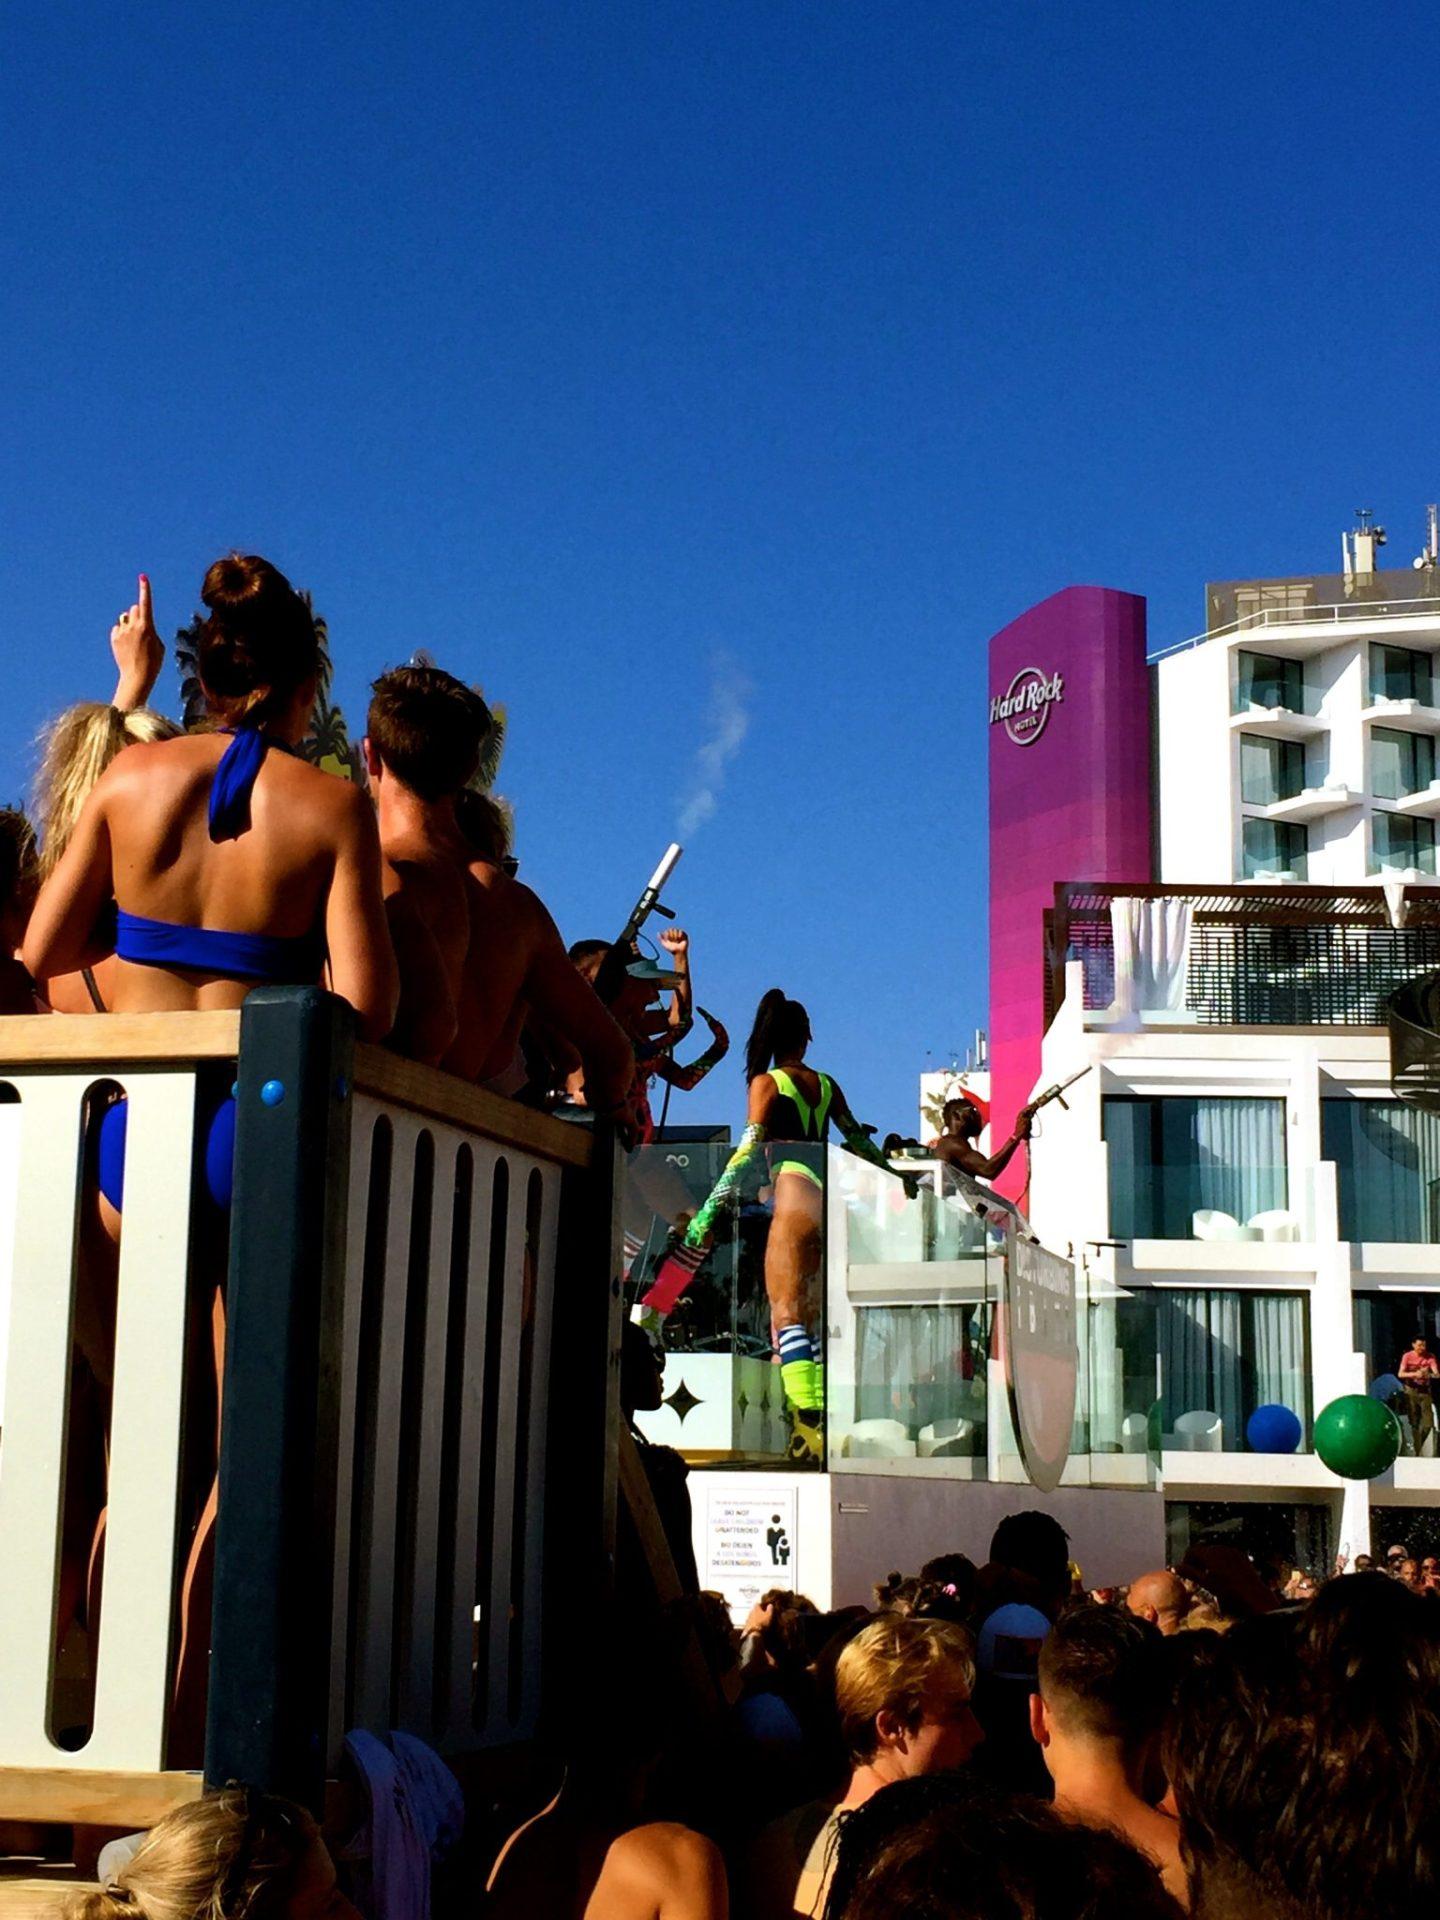 Tinie Tempah at Disturbing Ibiza, the Hard Rock Hotel Ibiza pool party